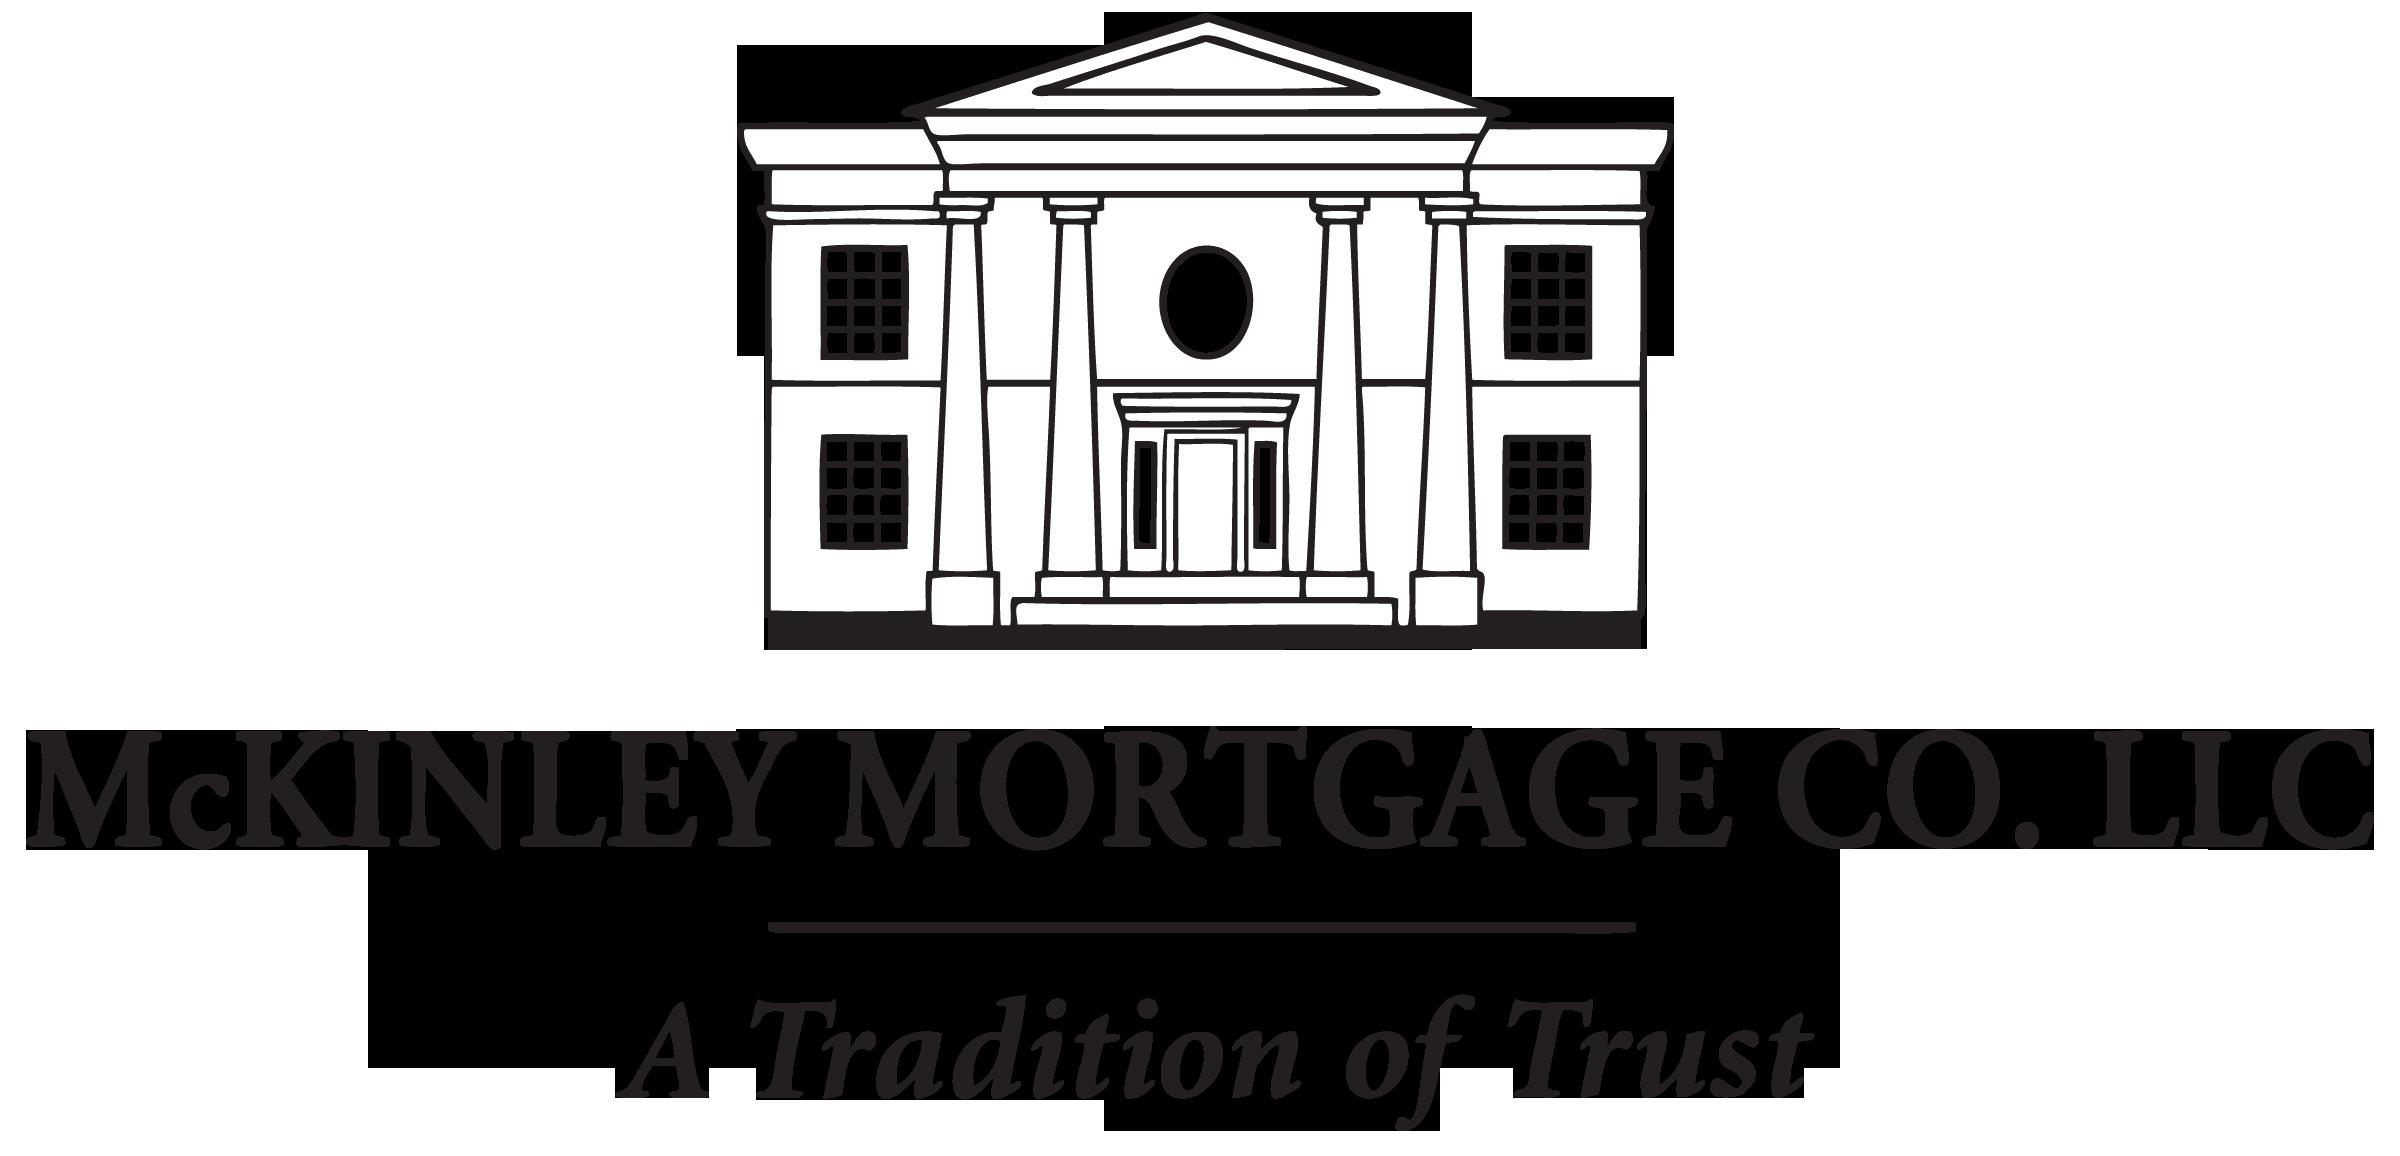 McKinley Mortgage logo.png